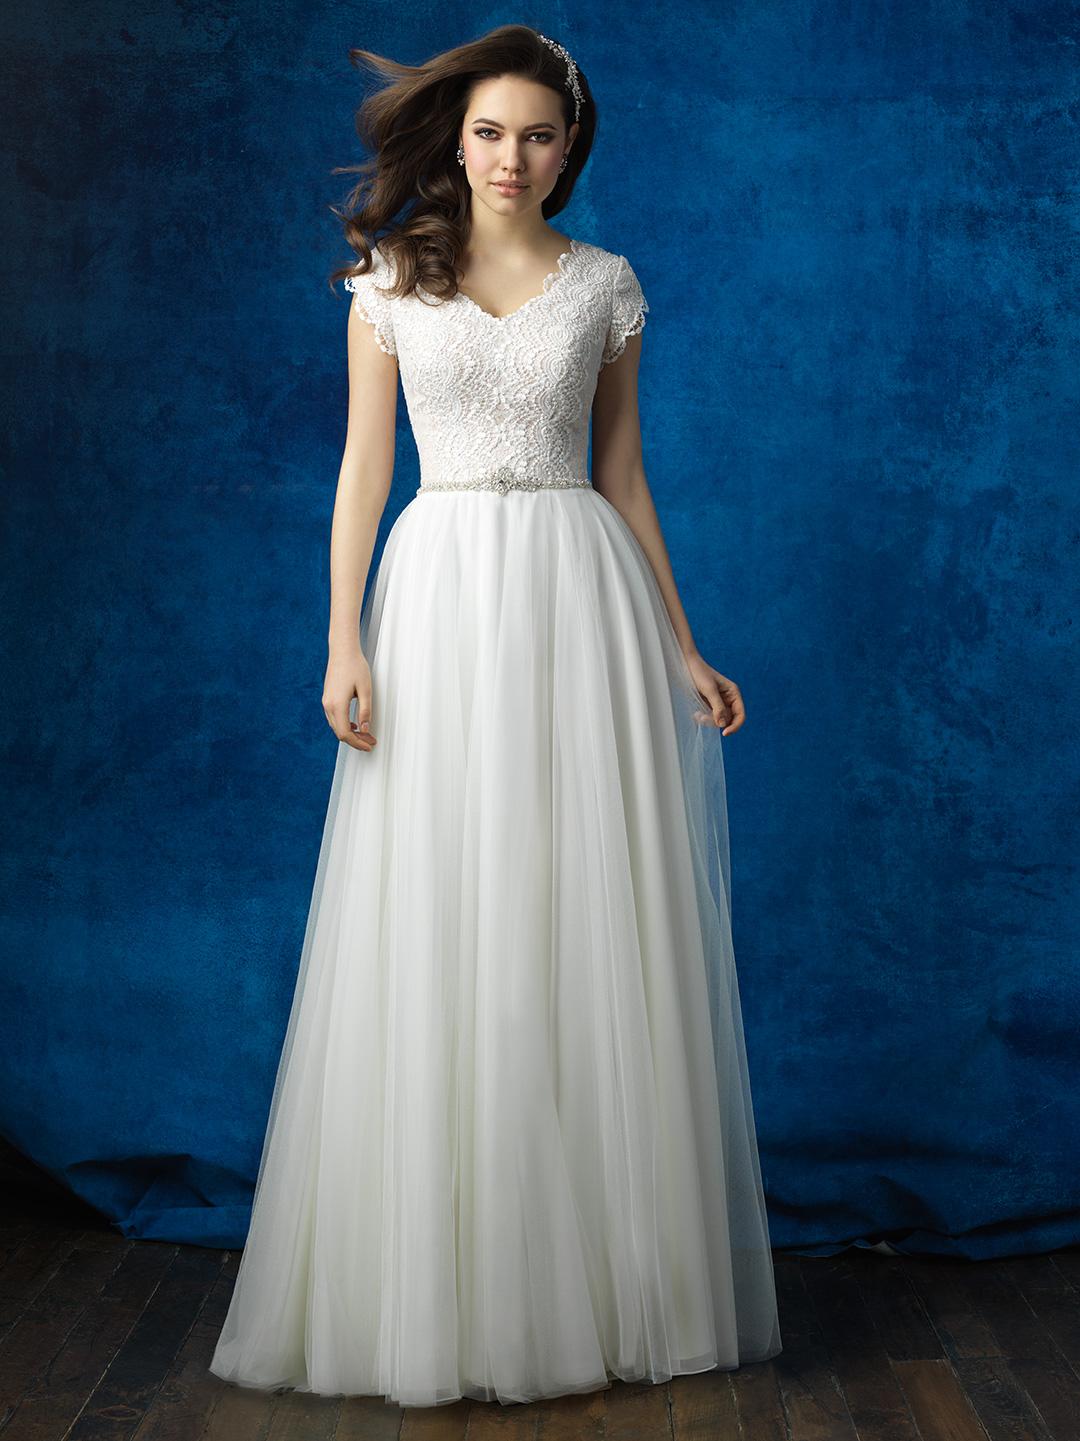 conservative wedding dress 20 Gorgeous Modest Wedding Dresses